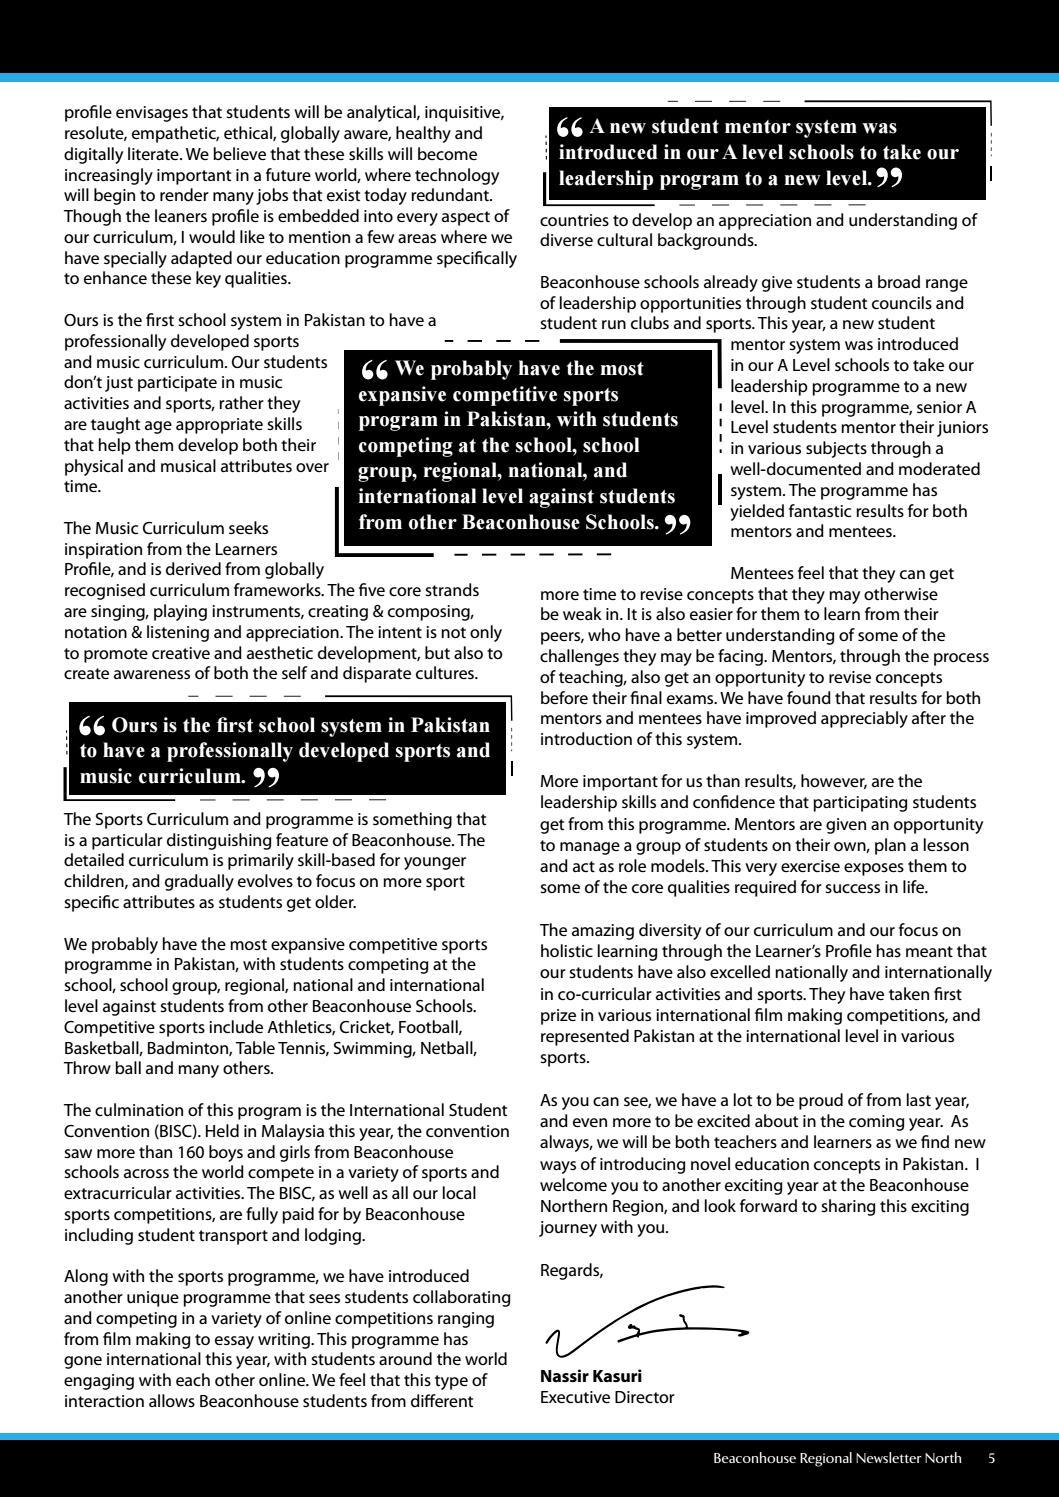 Regional Newsletter North Beaconhouse School System 2017-18